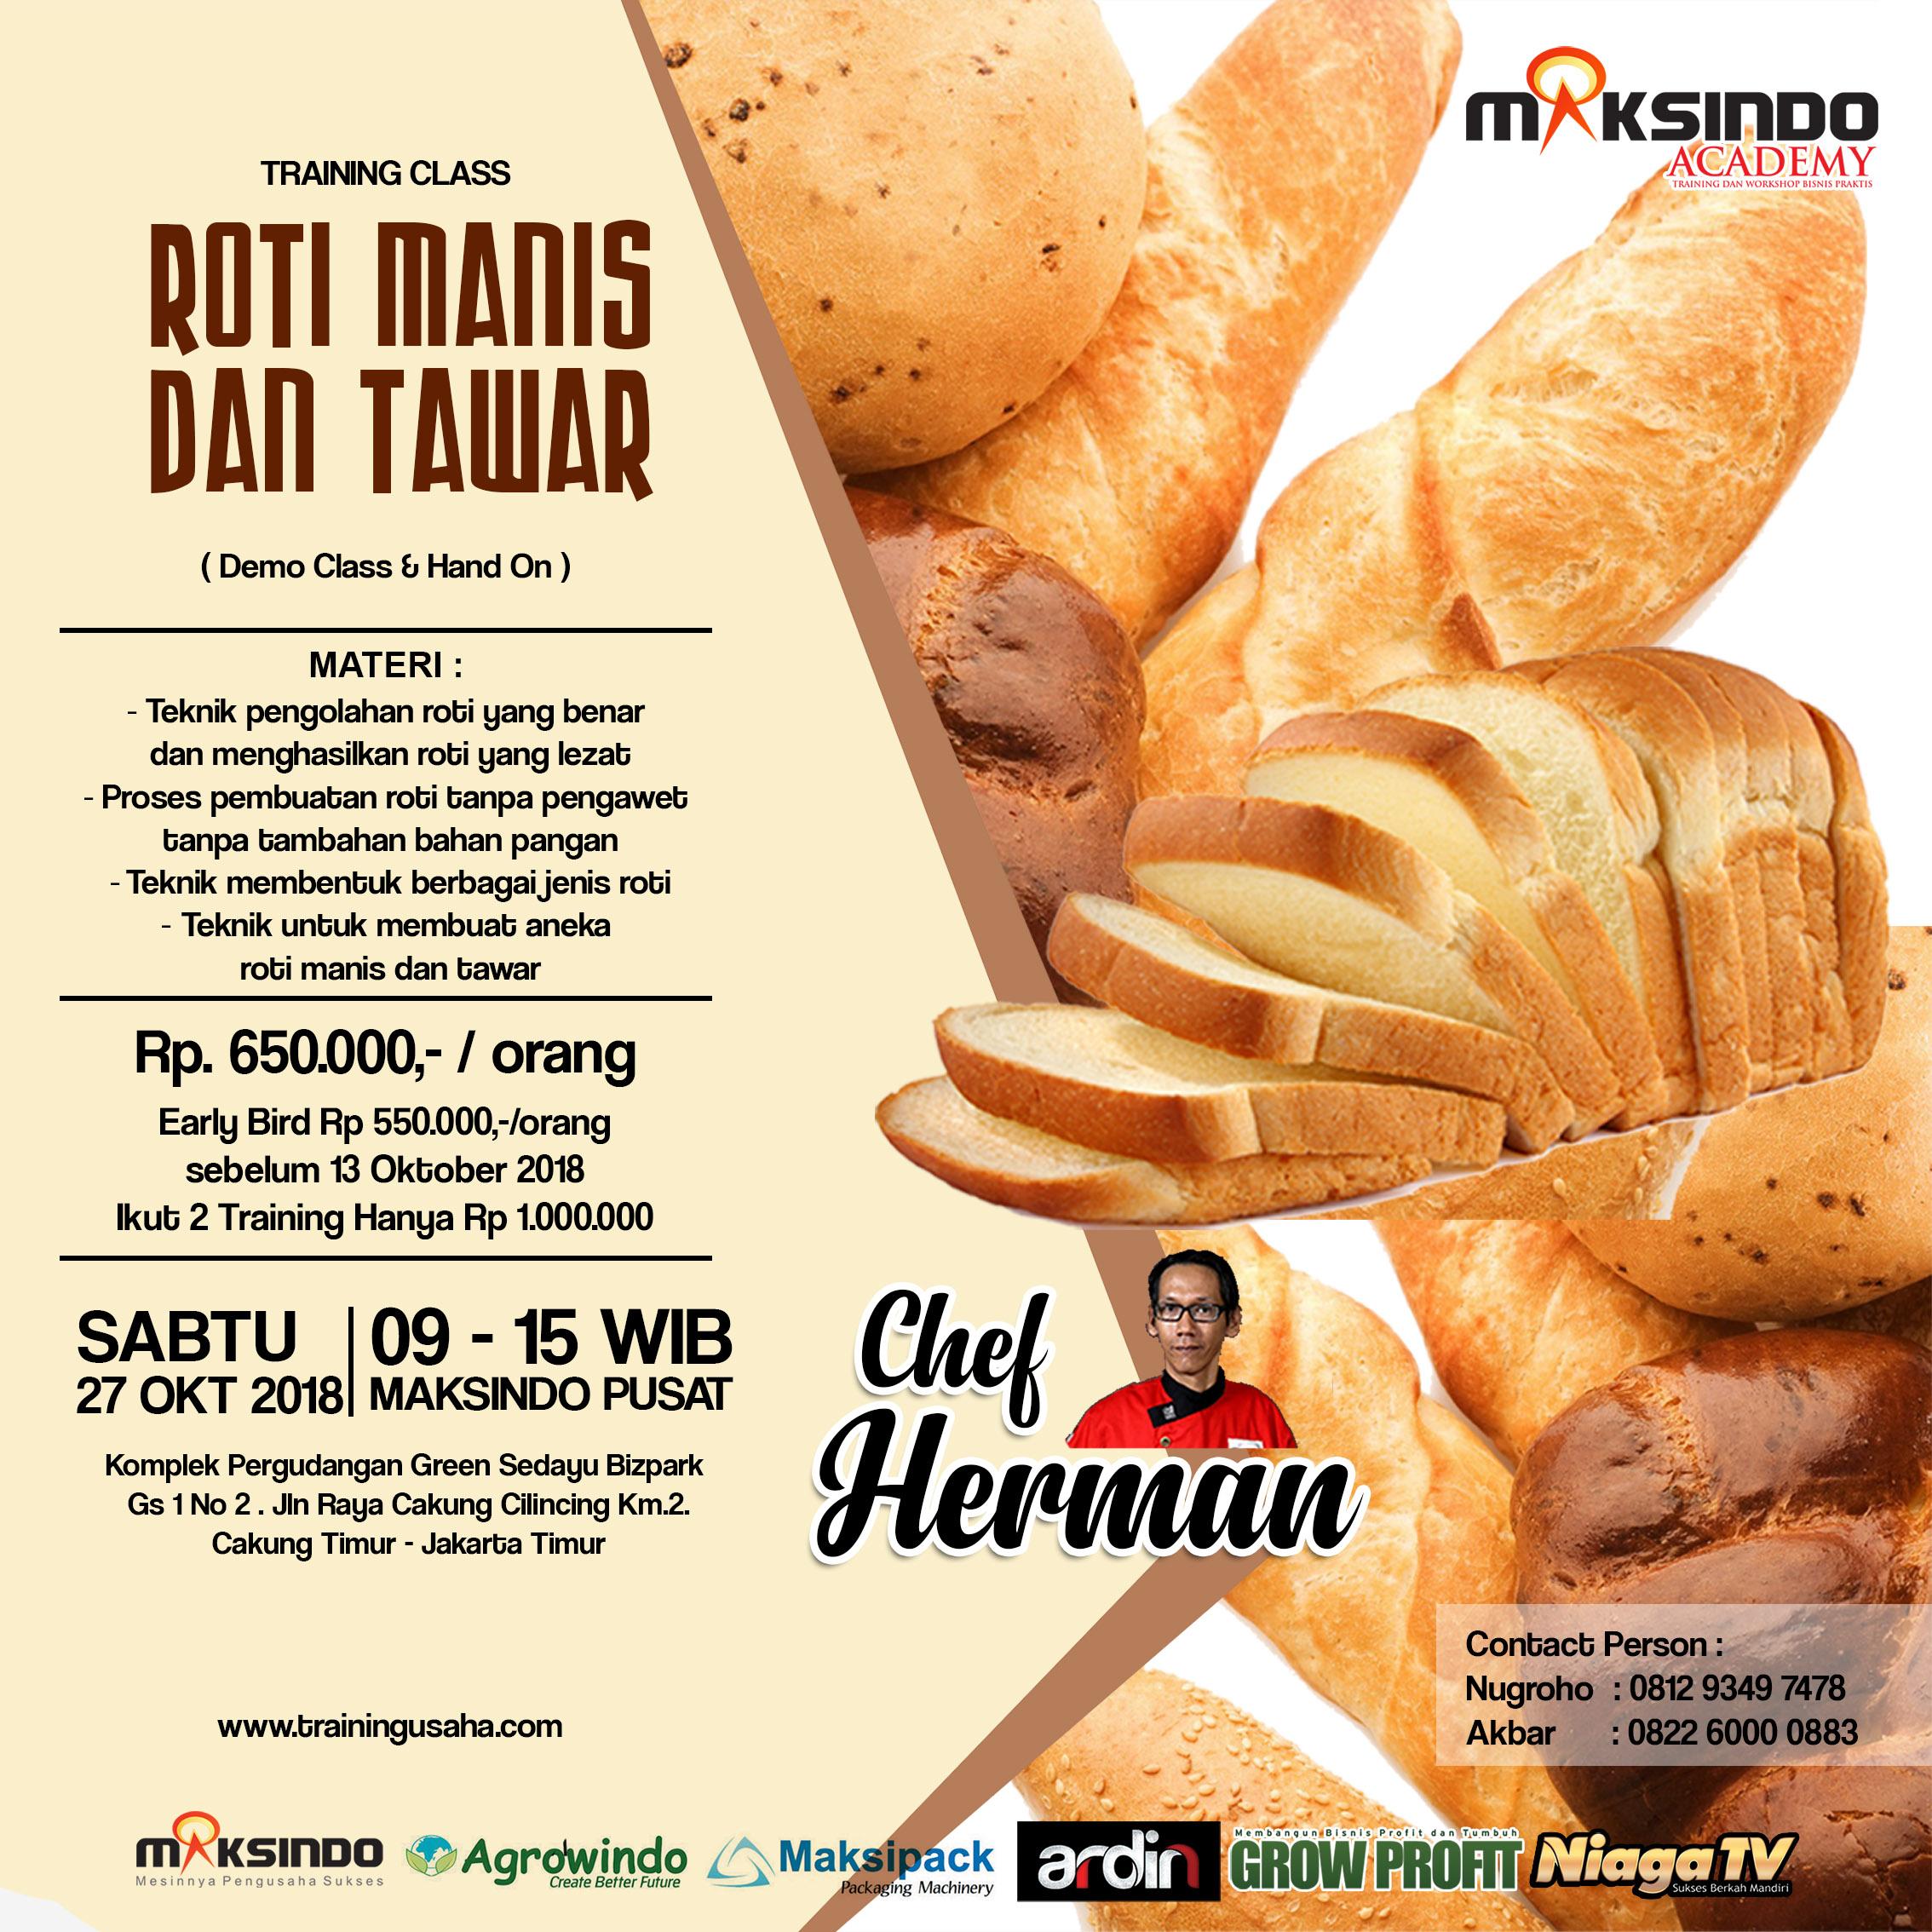 Training Usaha Roti Manis Dan Tawar, 27 Oktober 2018